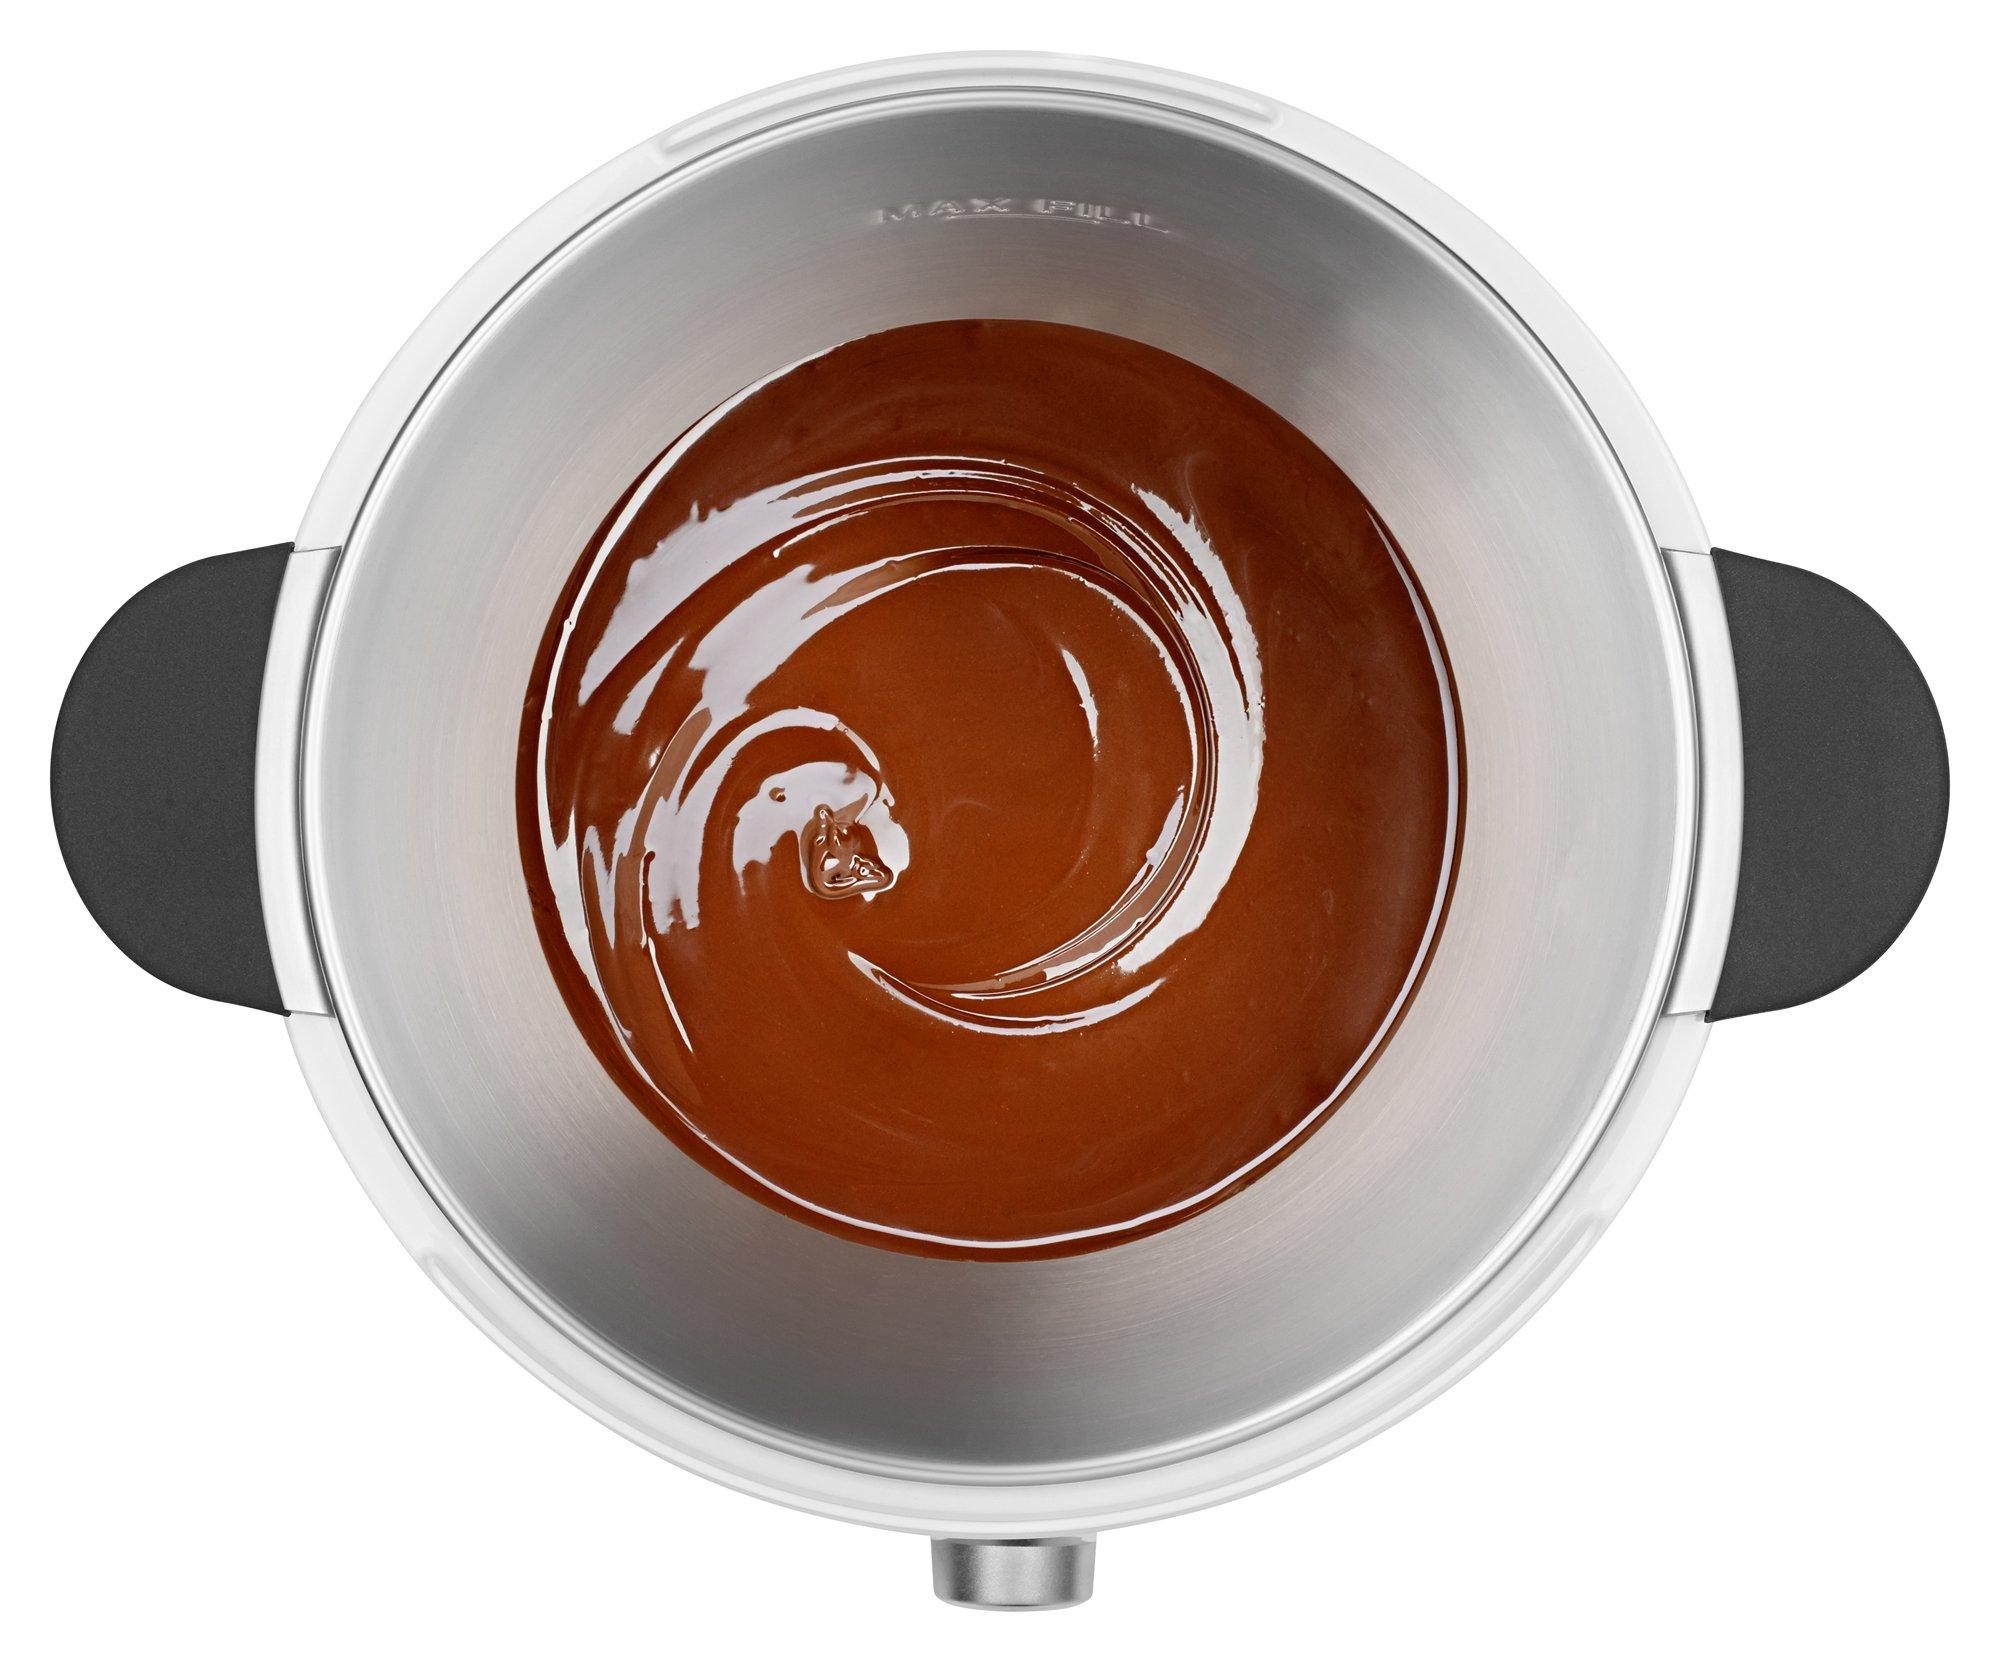 KitchenAid KSM1CBL Precise Heat Mixing Bowl For Bowl-Lift Stand Mixers by KitchenAid (Image #4)